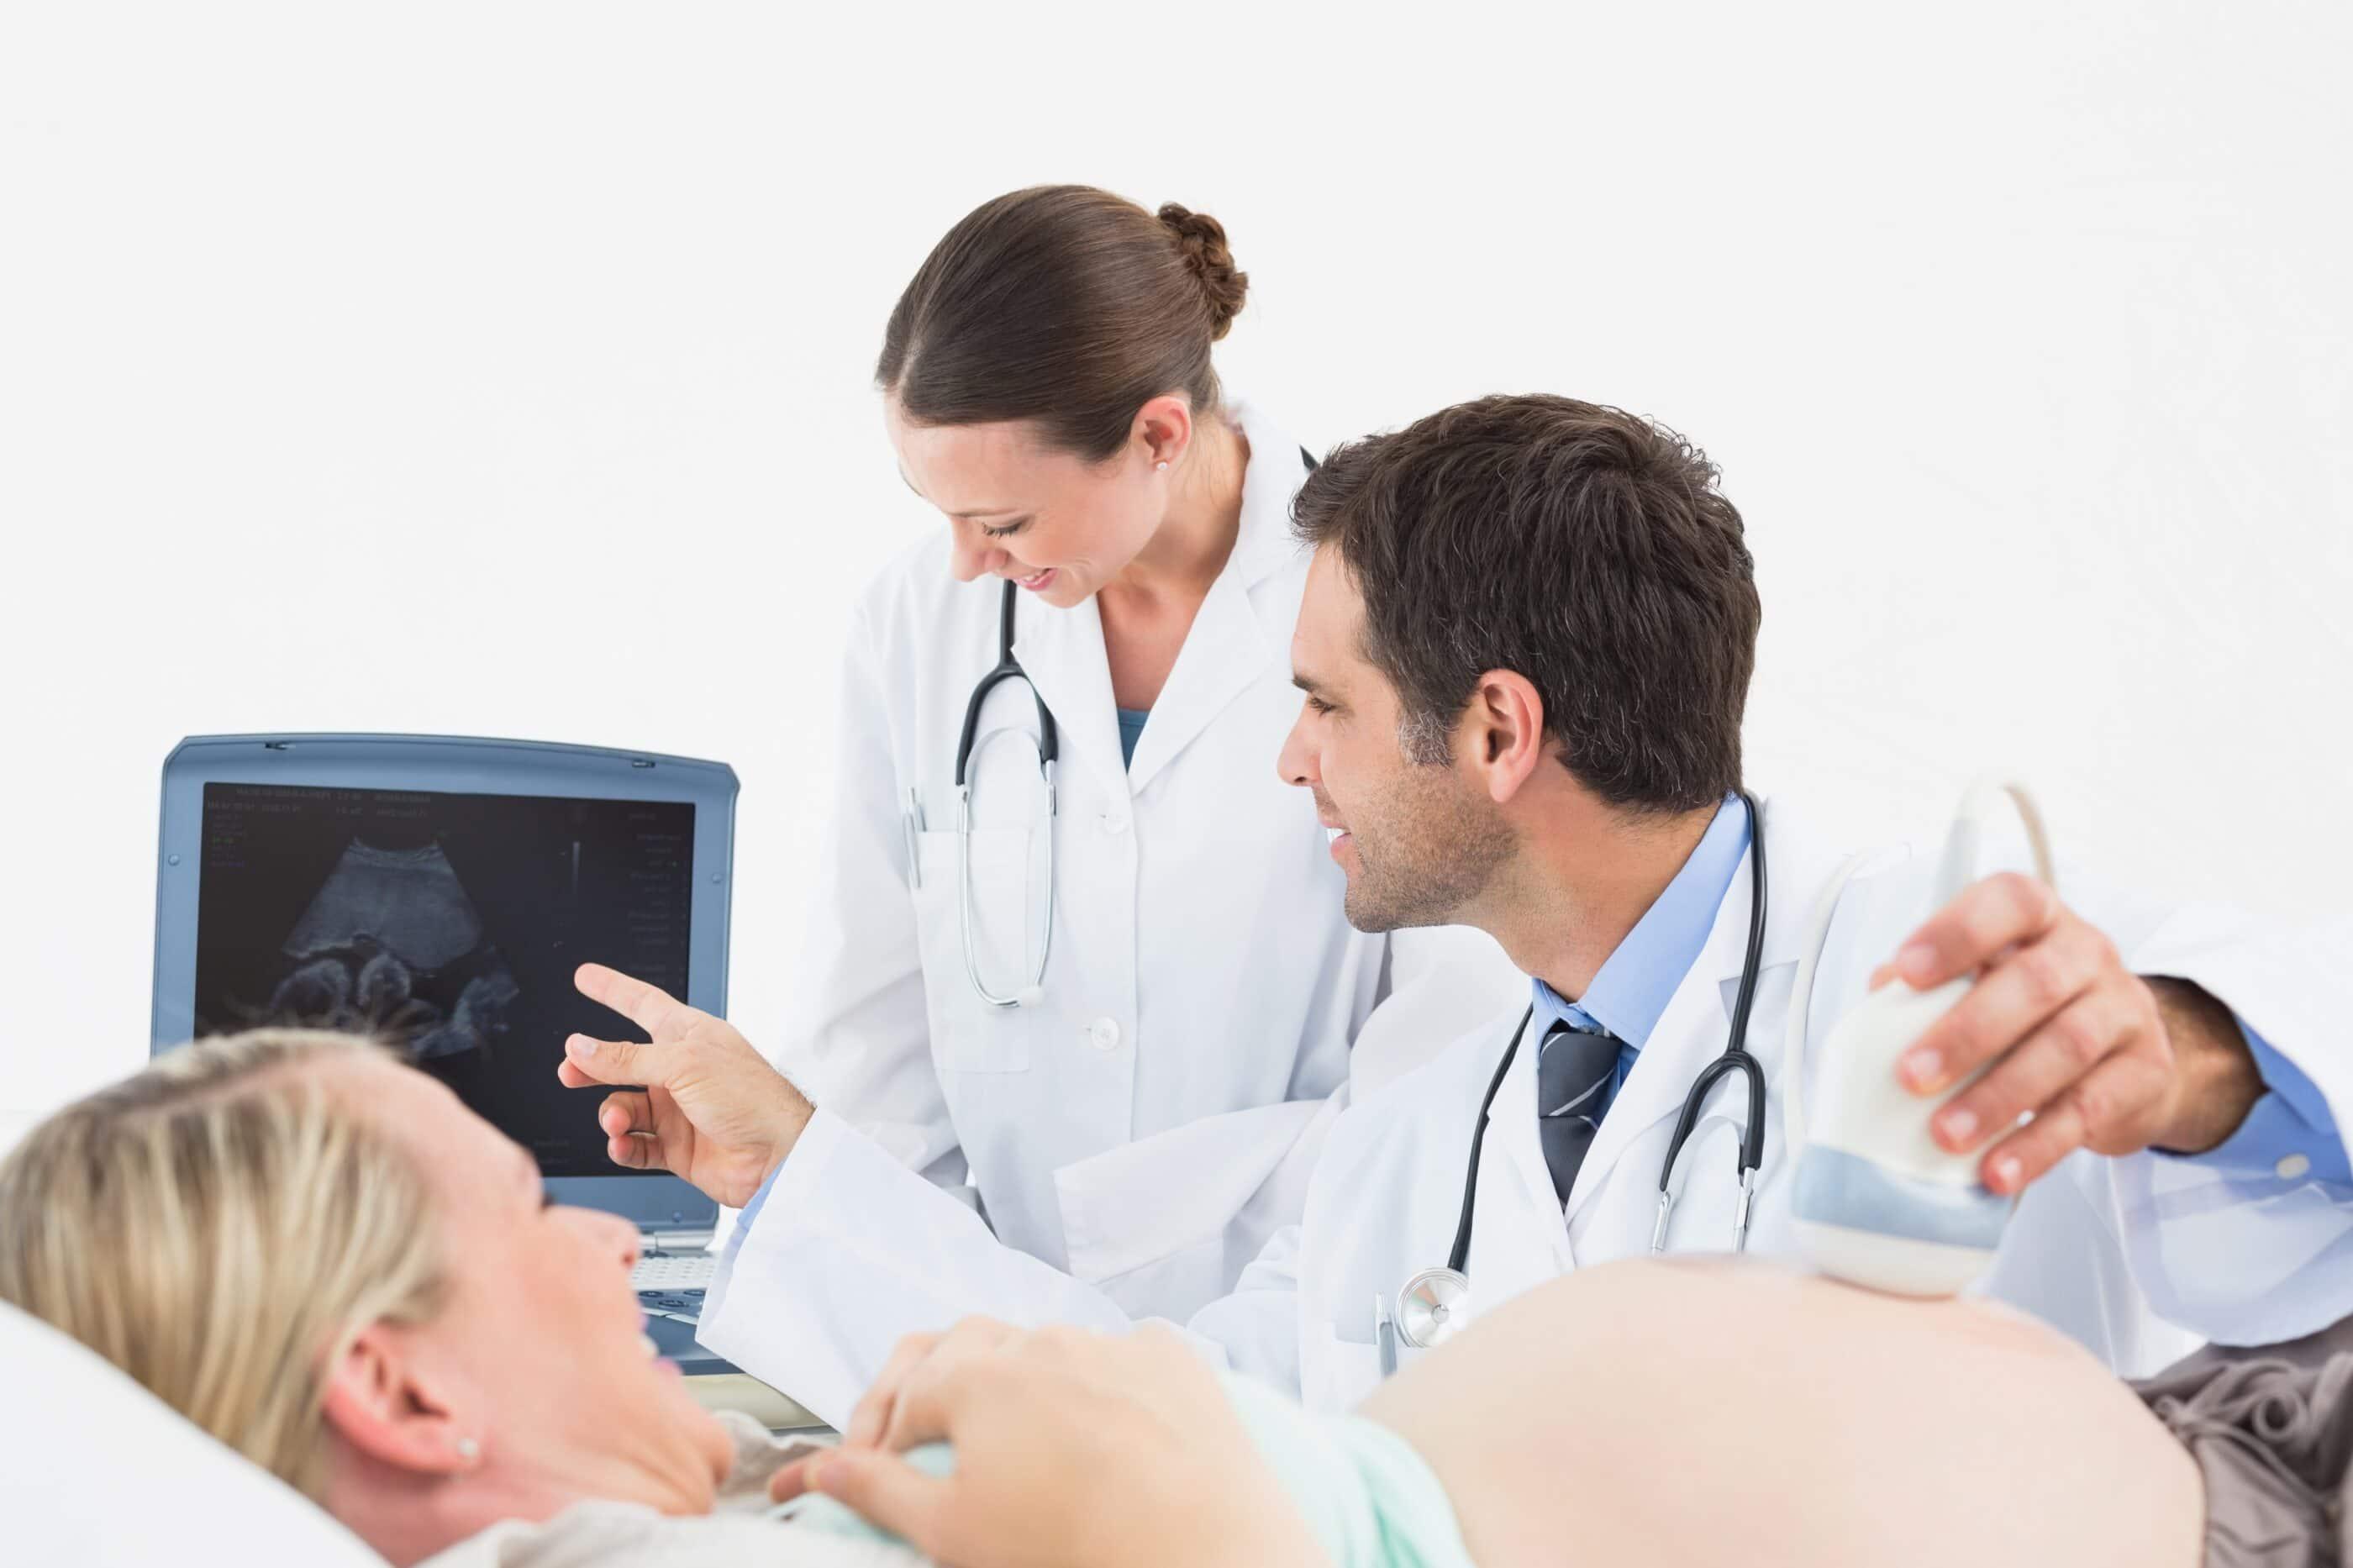 We perform diagnostic ultrasound exams